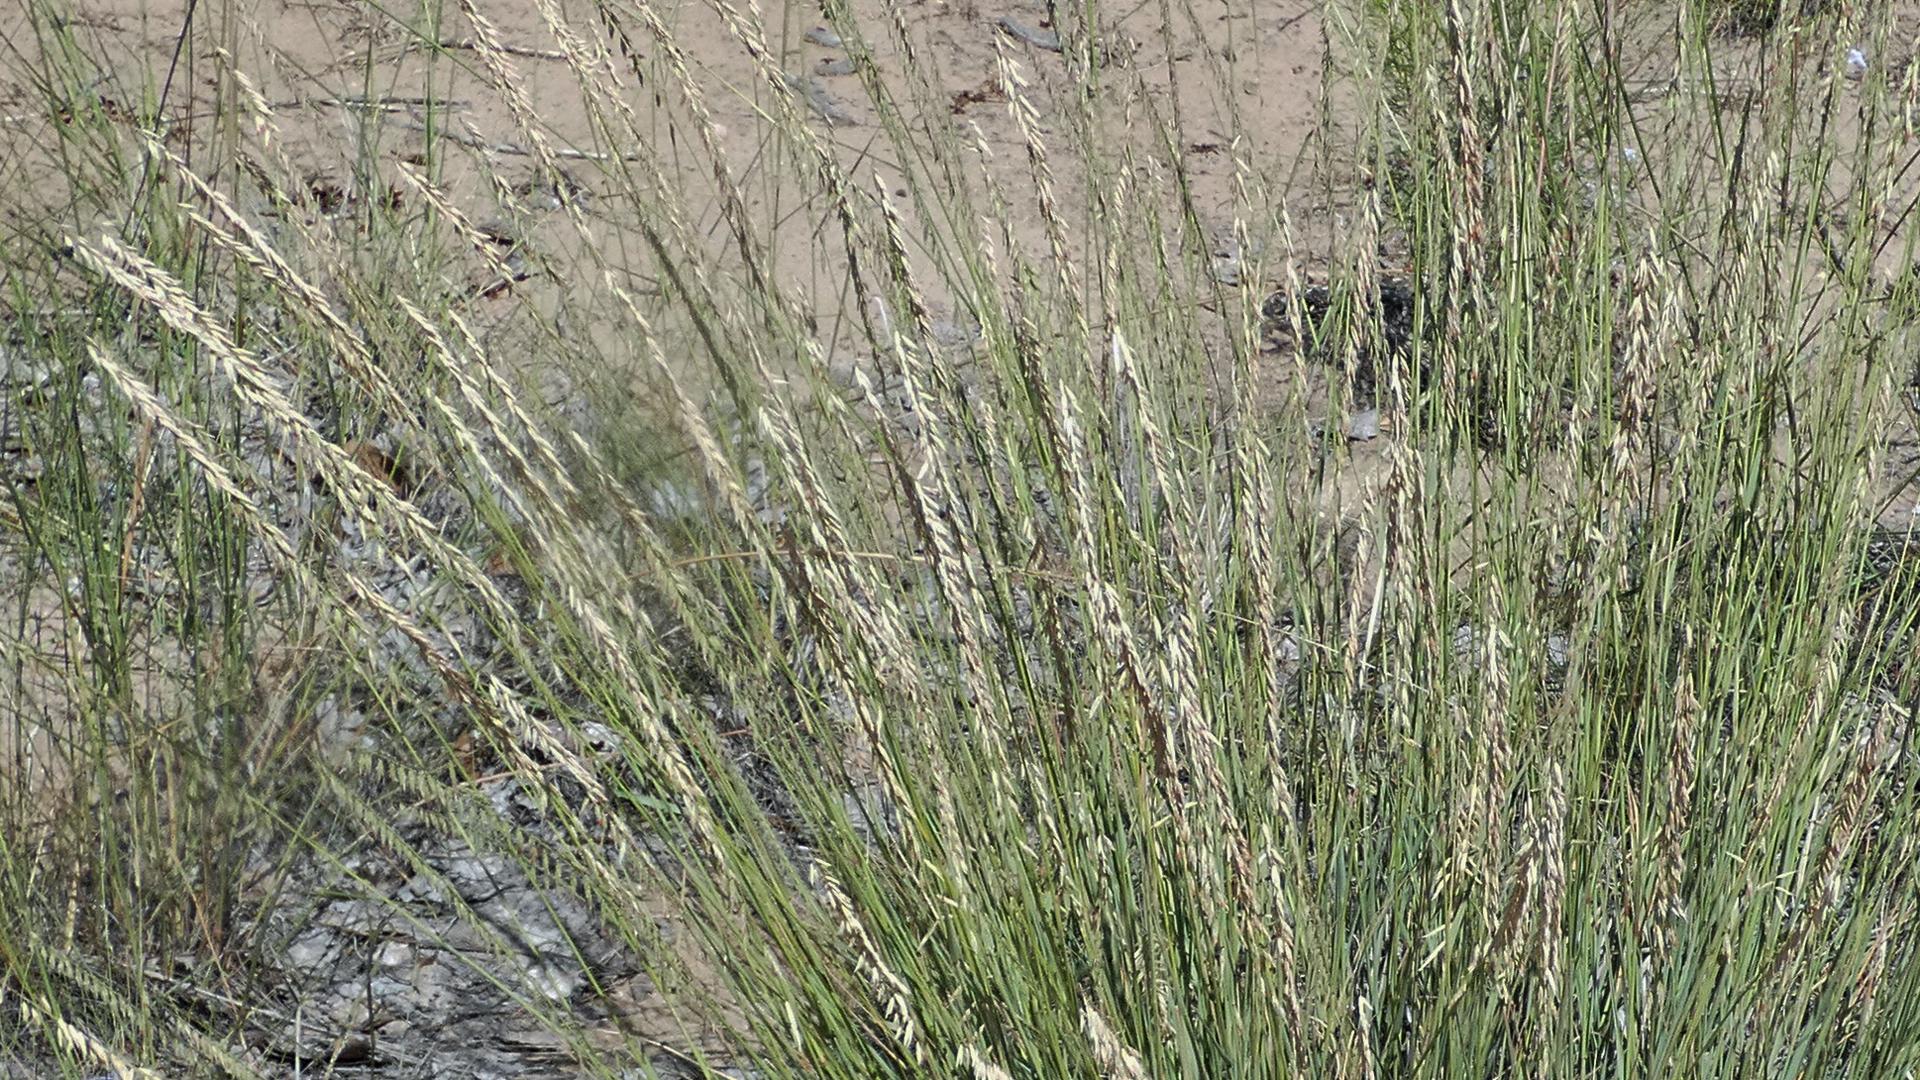 Rio Grande Bosque, Albuquerque, August 2021